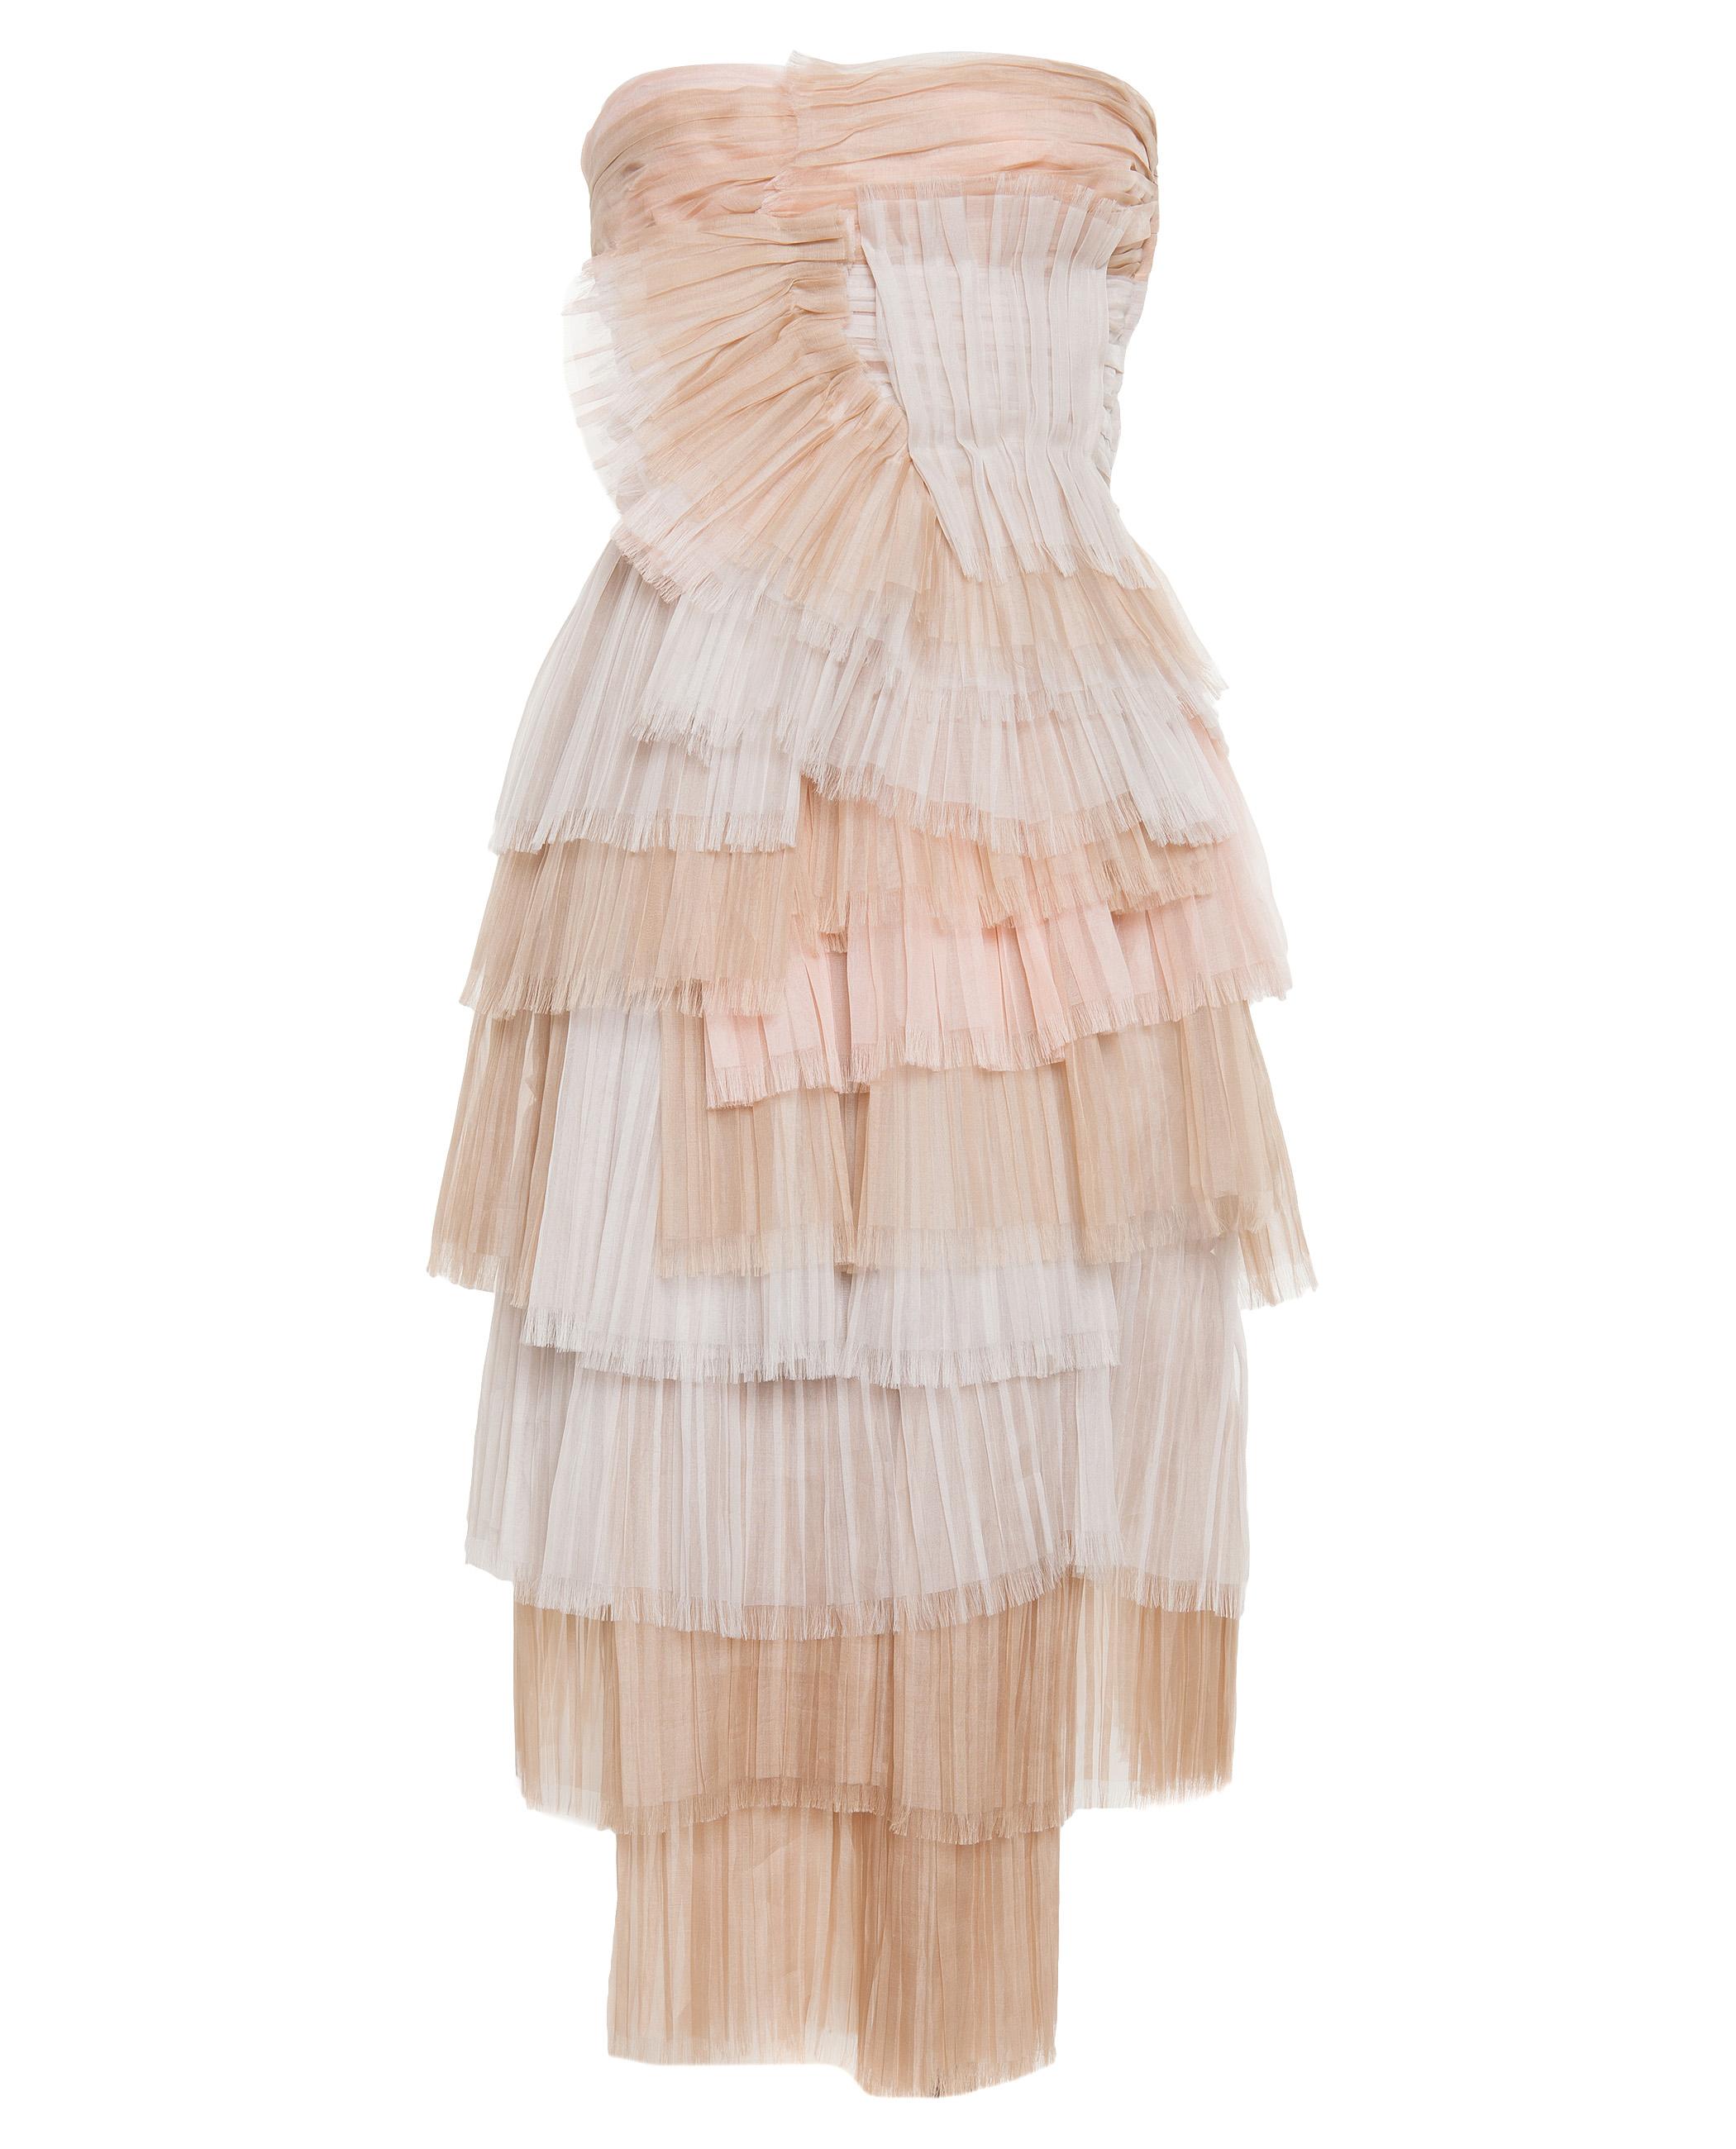 Burberry prorsum Layered Silk Bustier Dress in Pink - Lyst